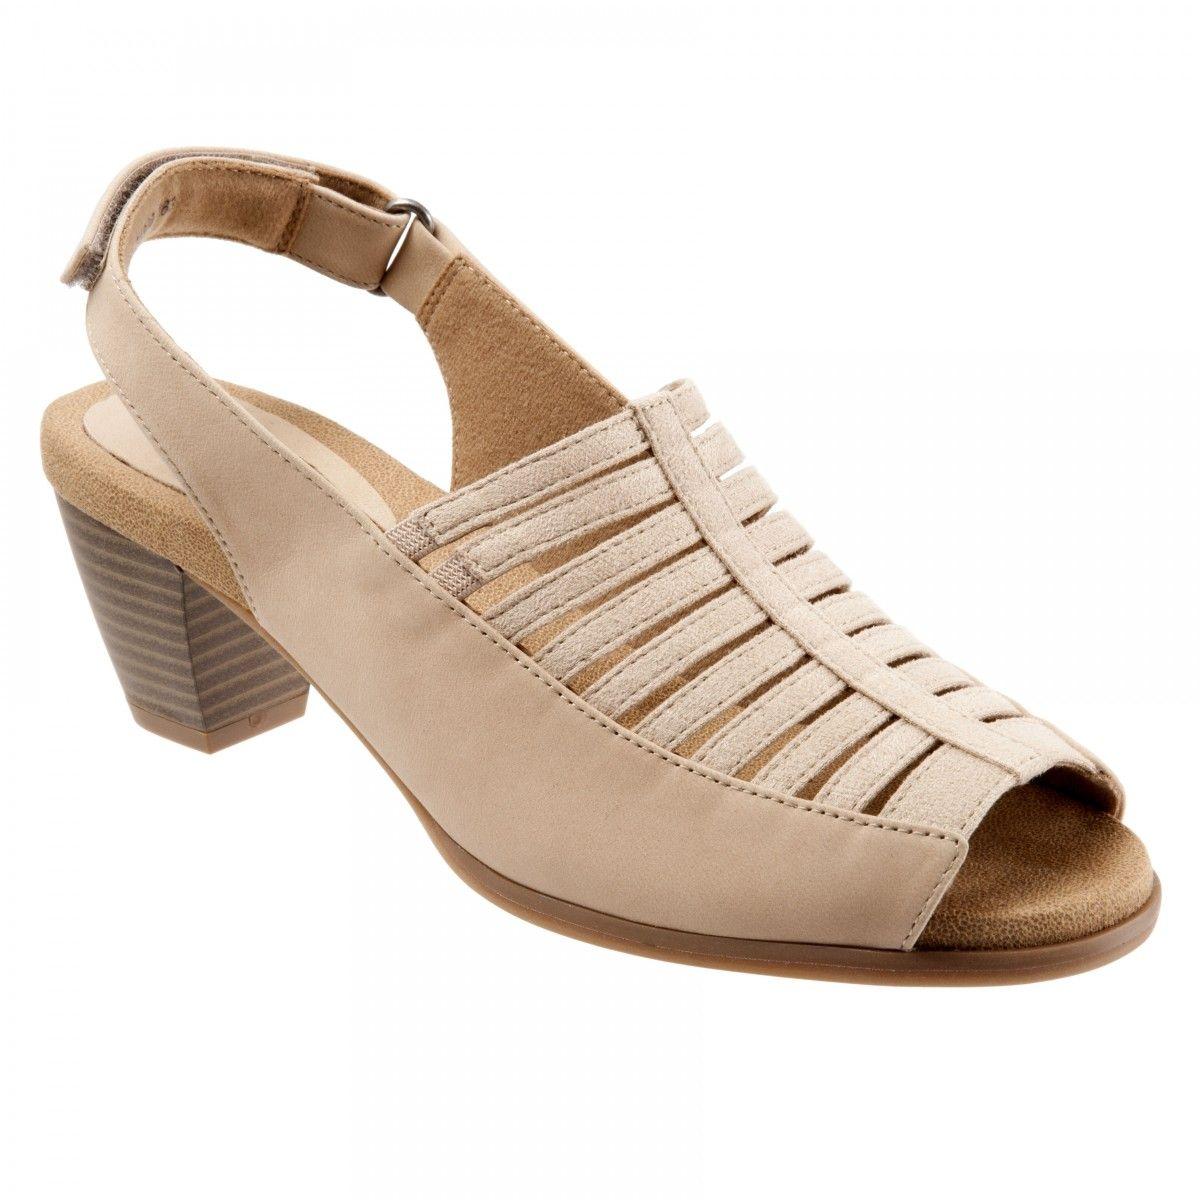 156764da0 Trotters Minnie Women s Heeled Sandal Nude Nu - 7.5 Medium